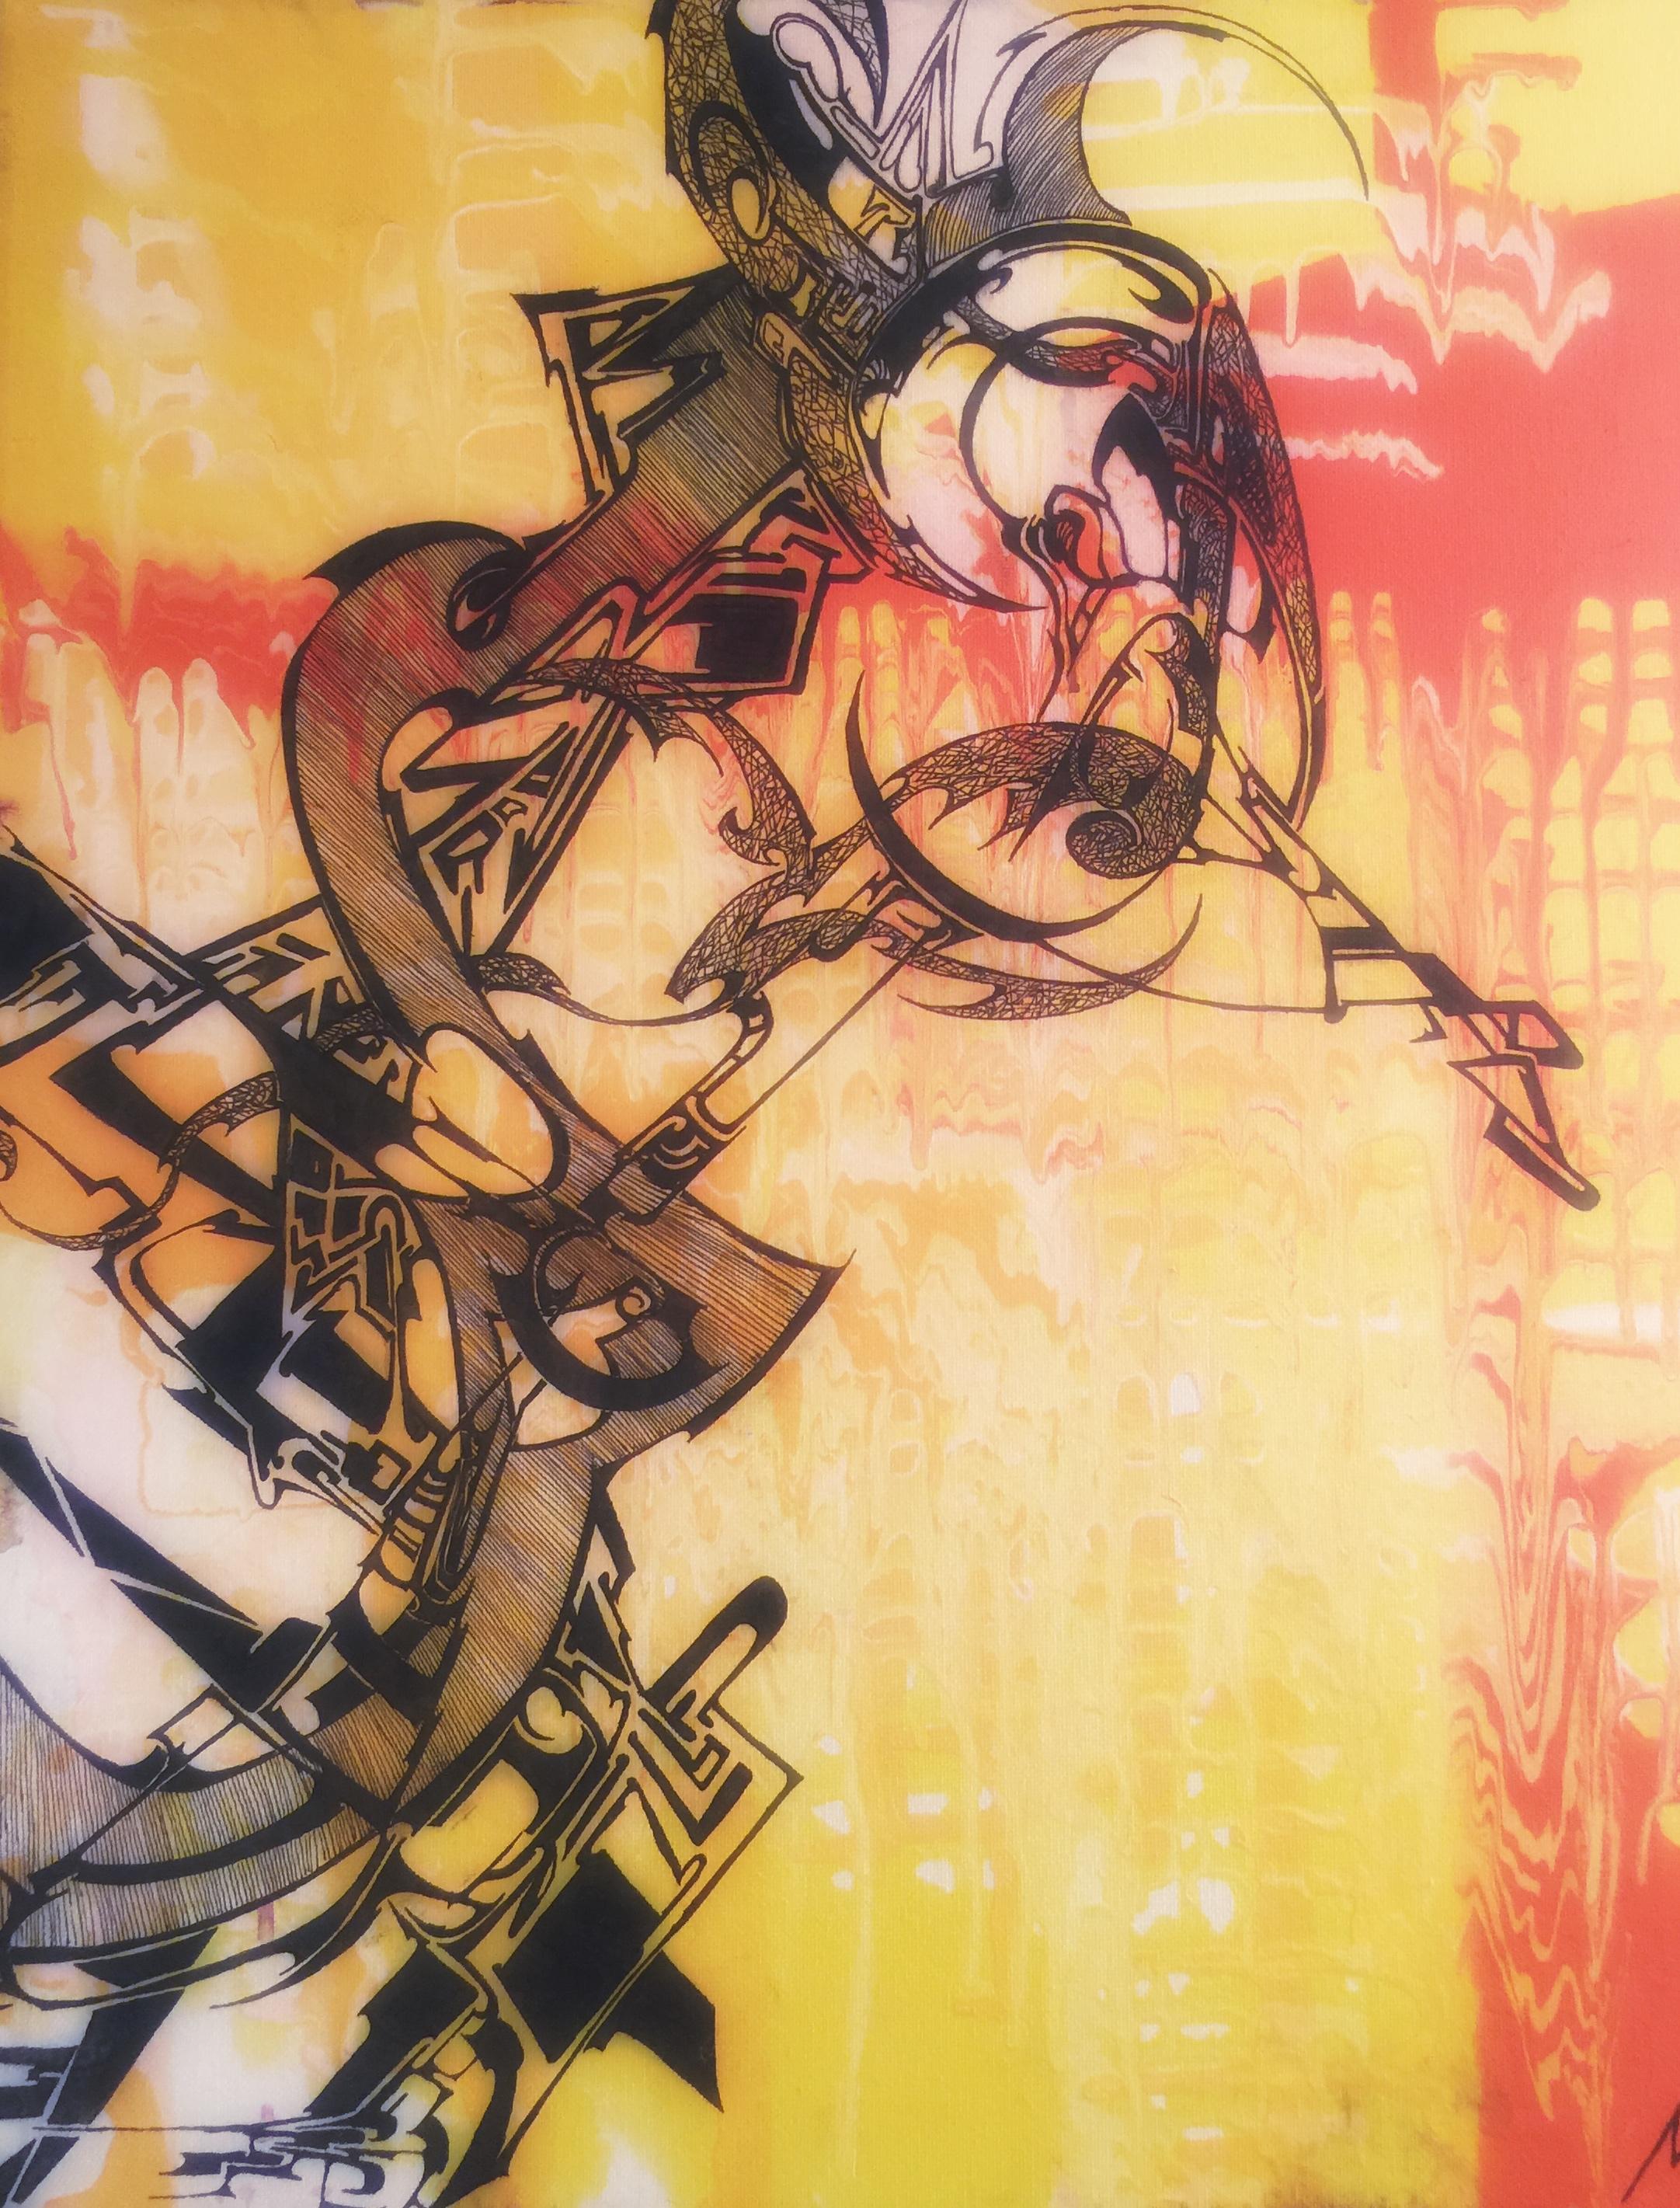 """La Mujer De Citron""  In the private collection of Valient & Lillie R. Cuiellette."